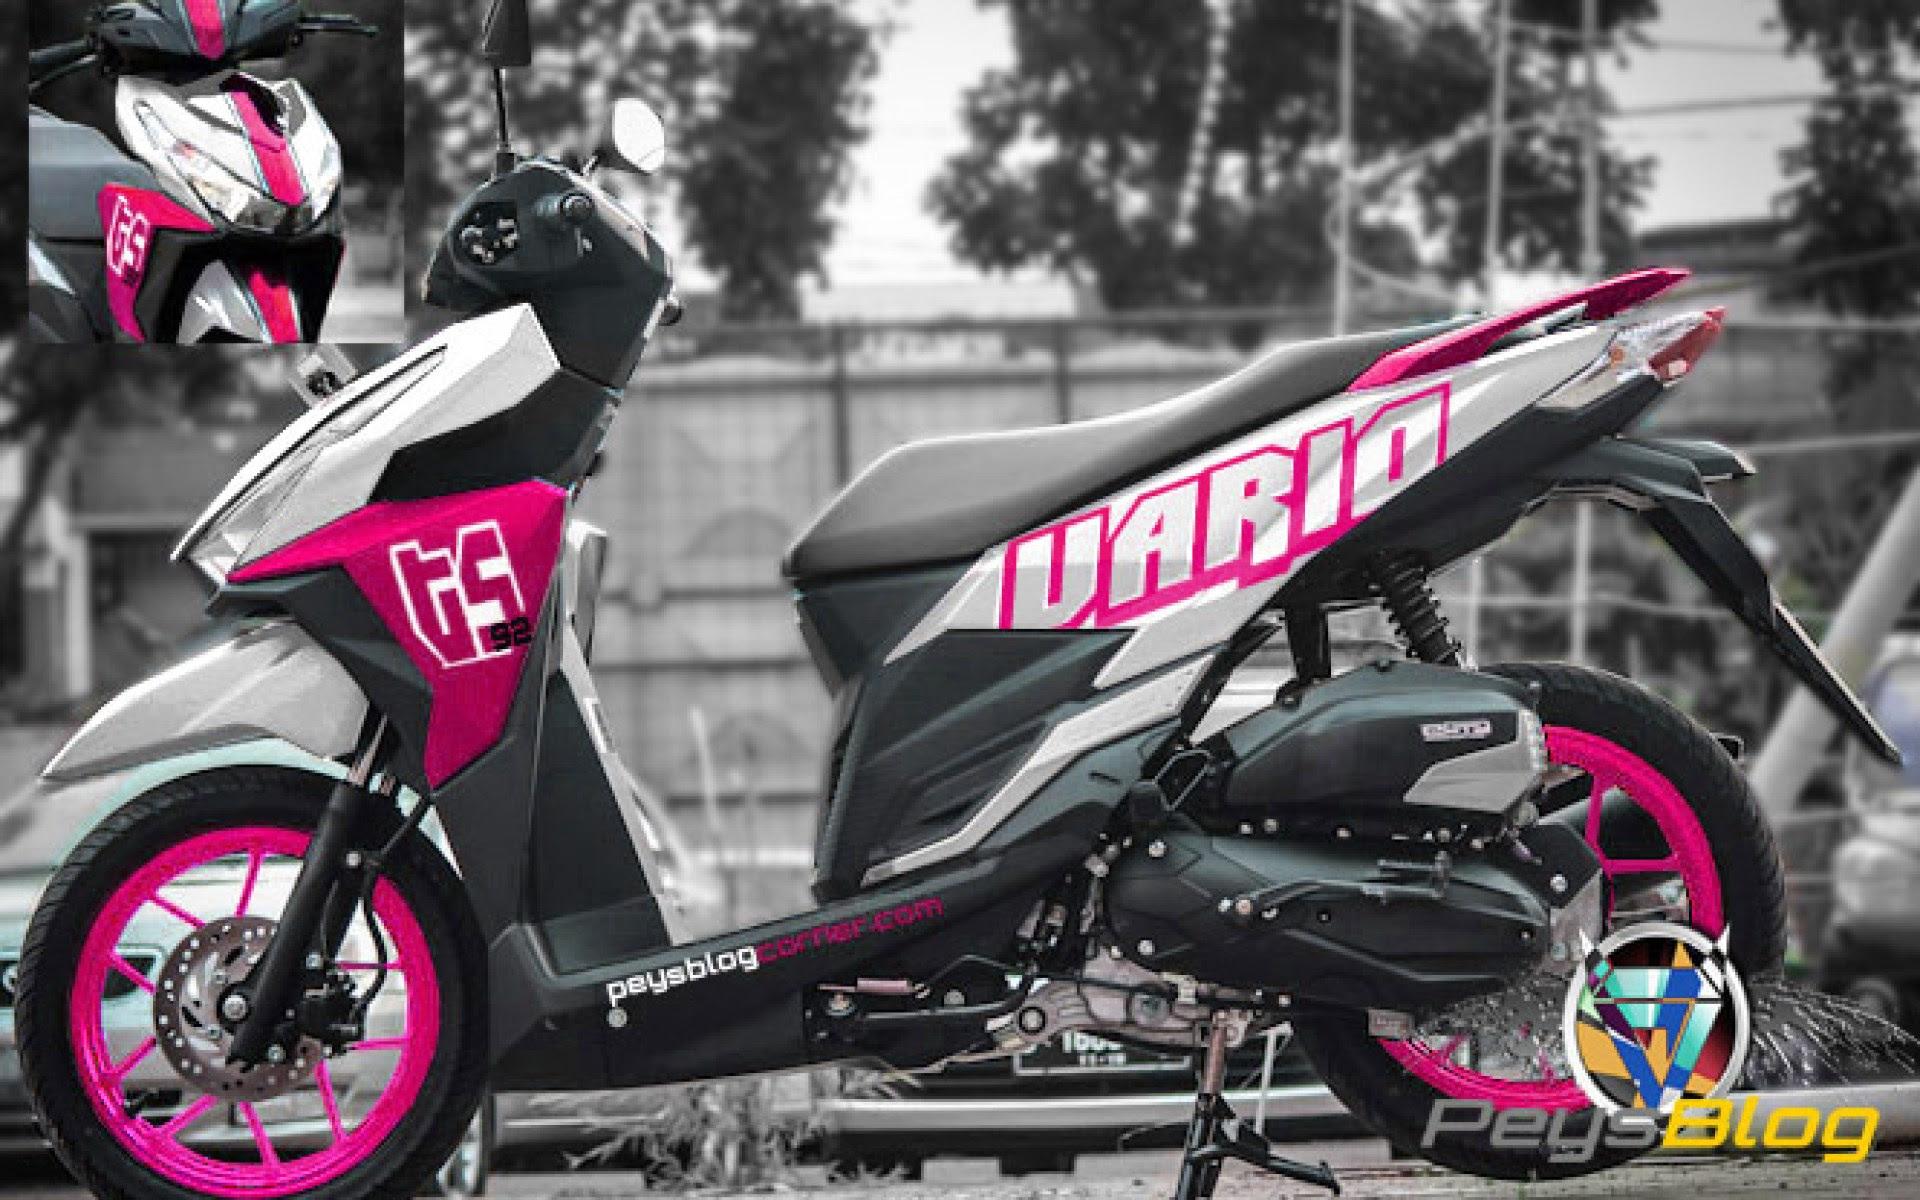 74 Gambar Modifikasi Motor Warna Pink Terbaru Kakashi Modifikasi